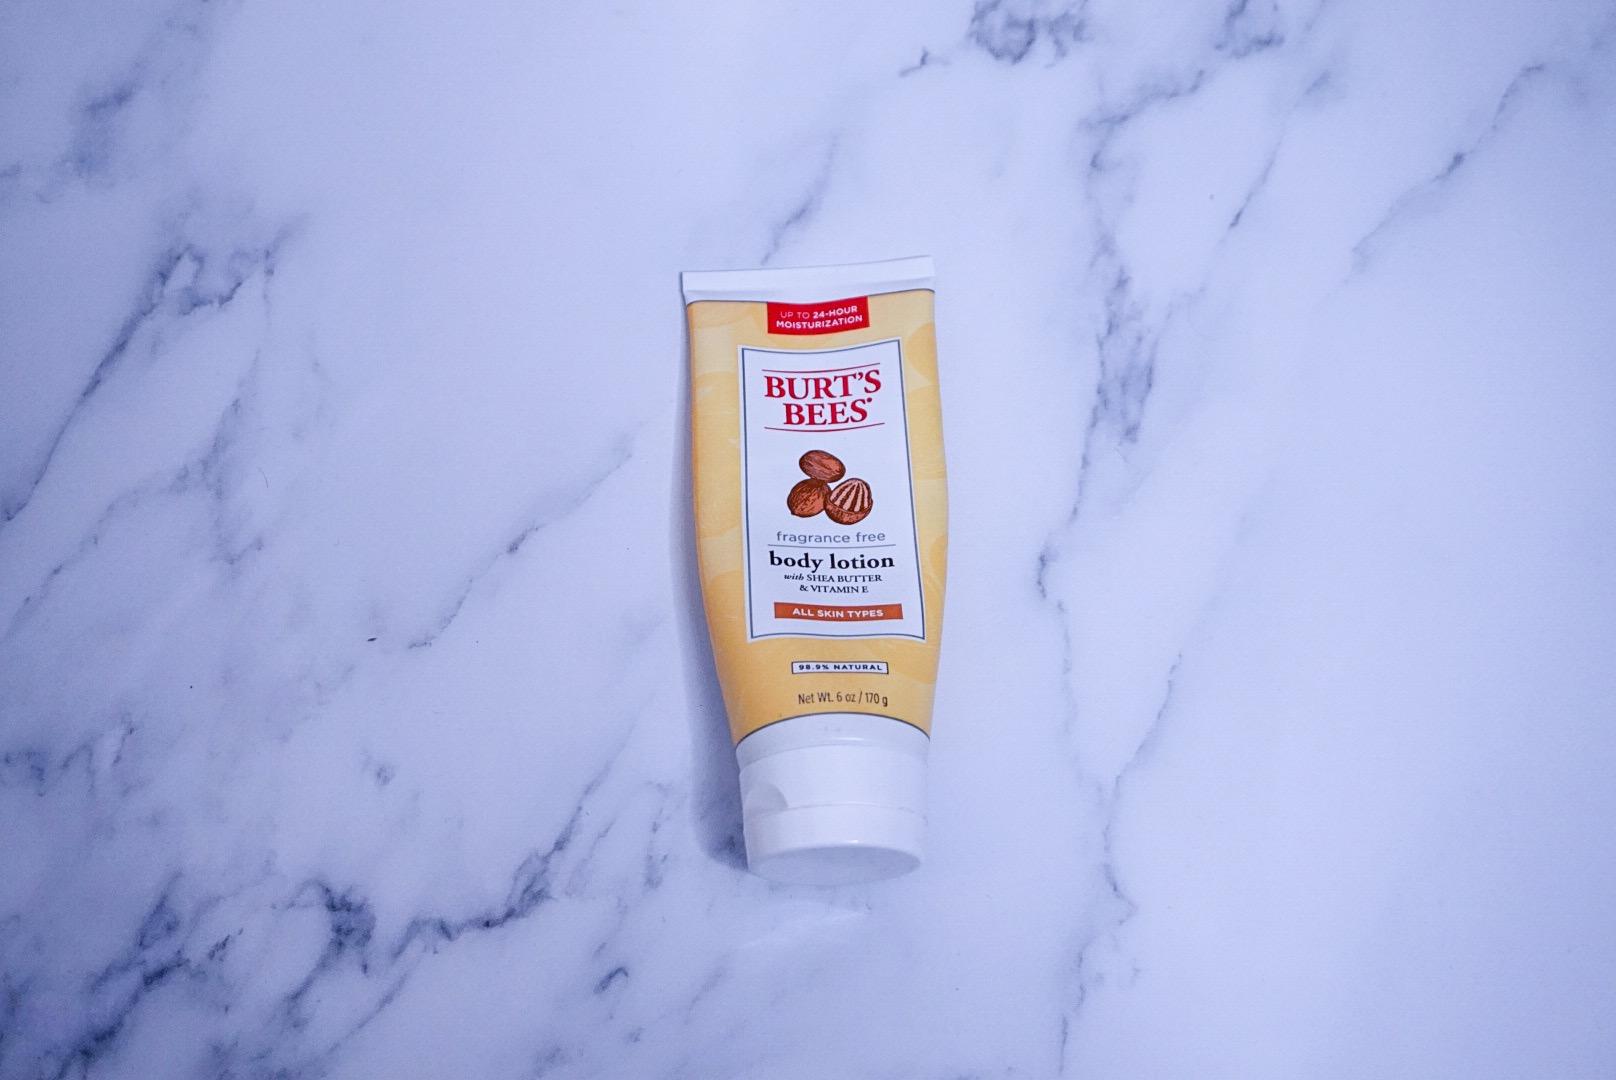 Best Drug Store Skin Care: Burt's Bees Body Lotion